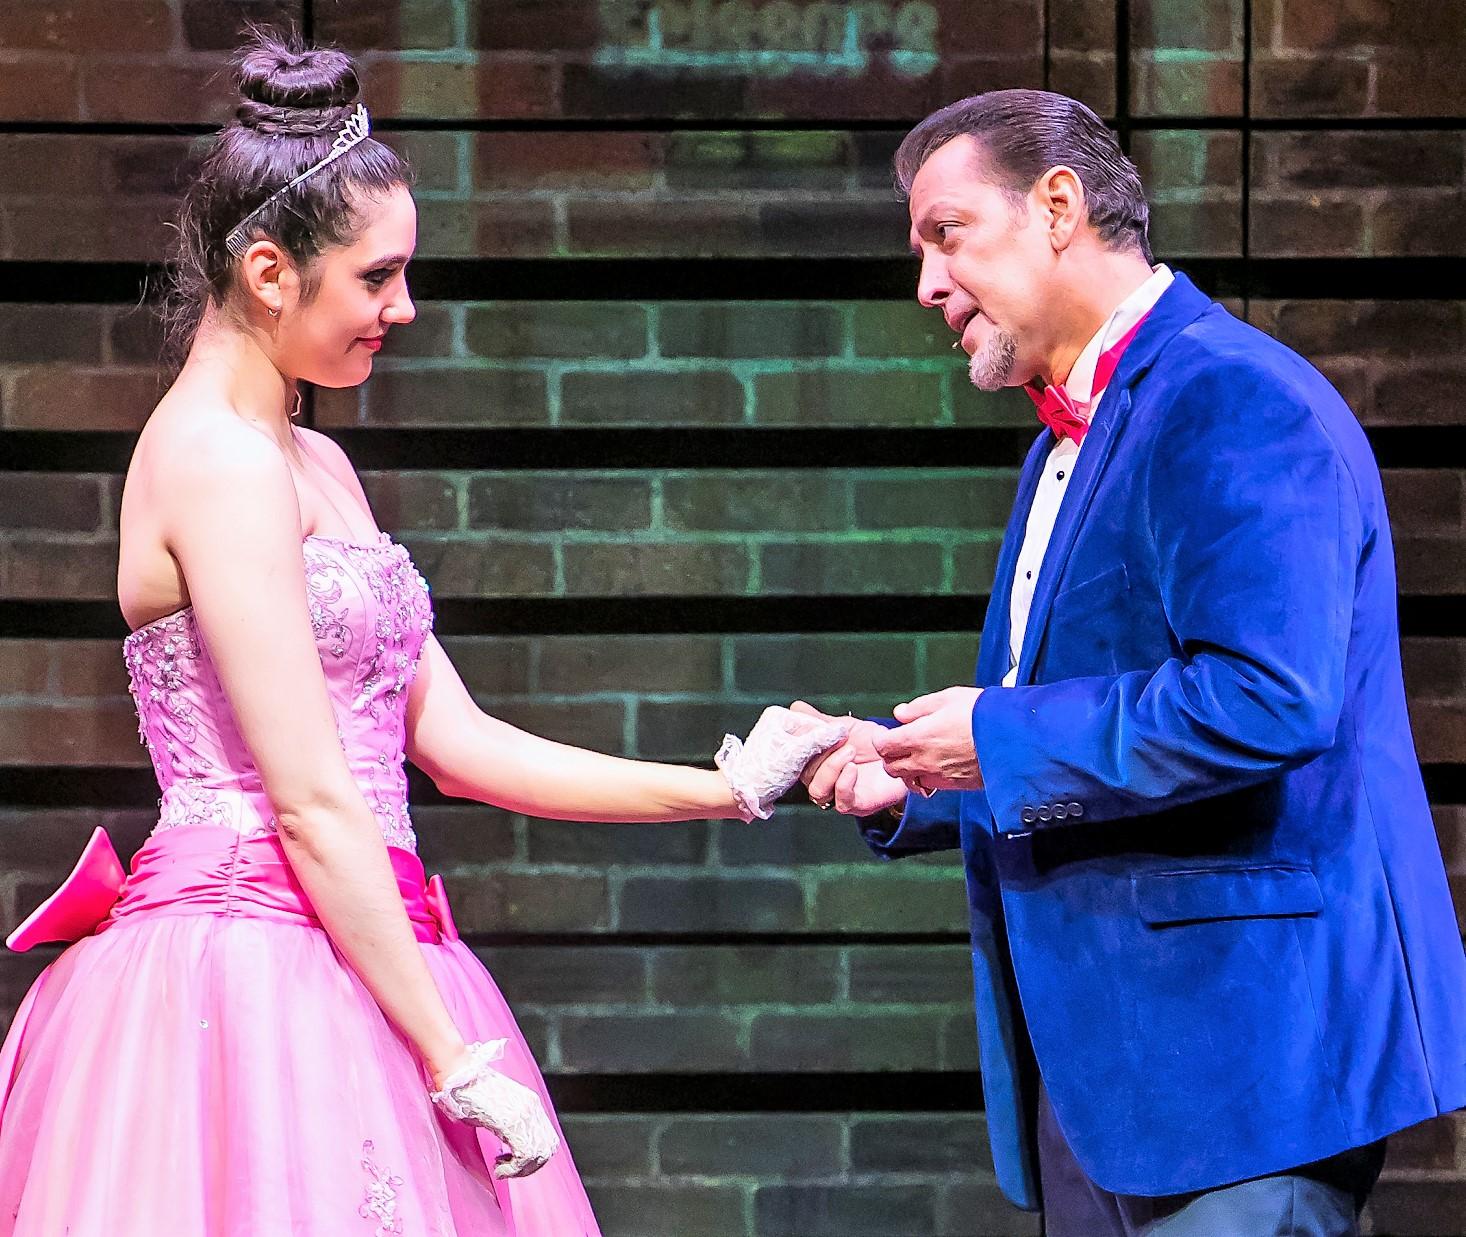 Quiñones with Sofia Klimovsky as his daughter Paula. Photo by Marisol Diaz.